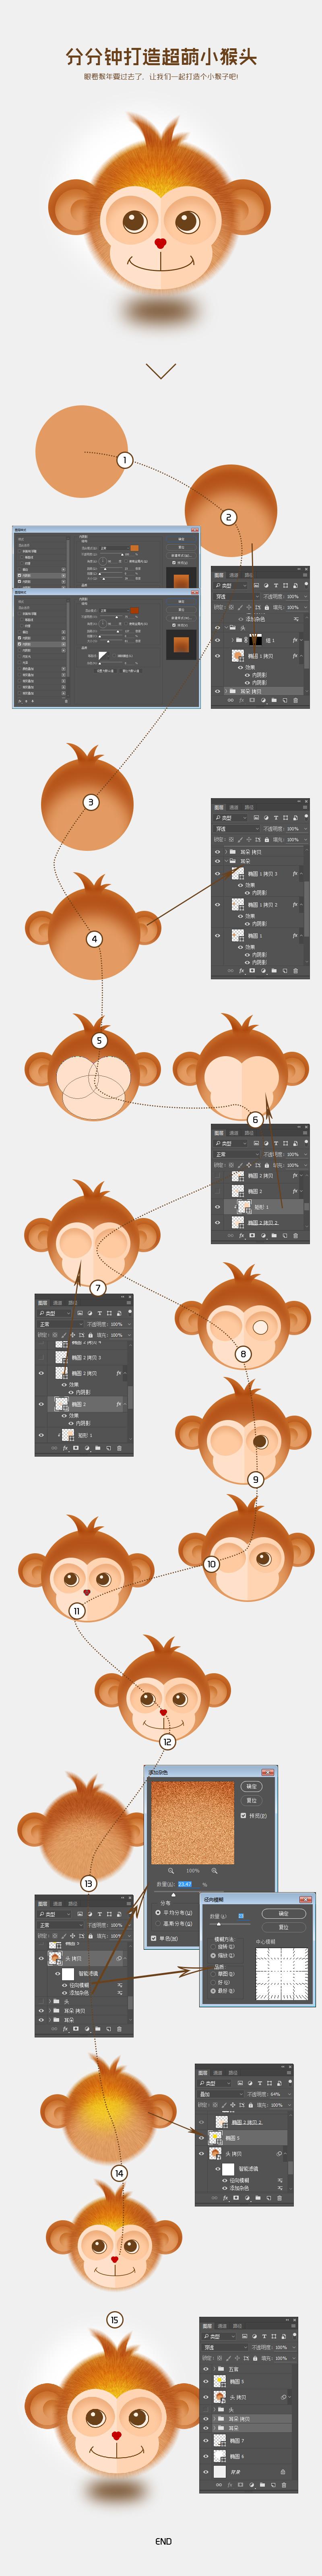 Photoshop简单快速的绘制超萌的喉头,PS教程,思缘教程网